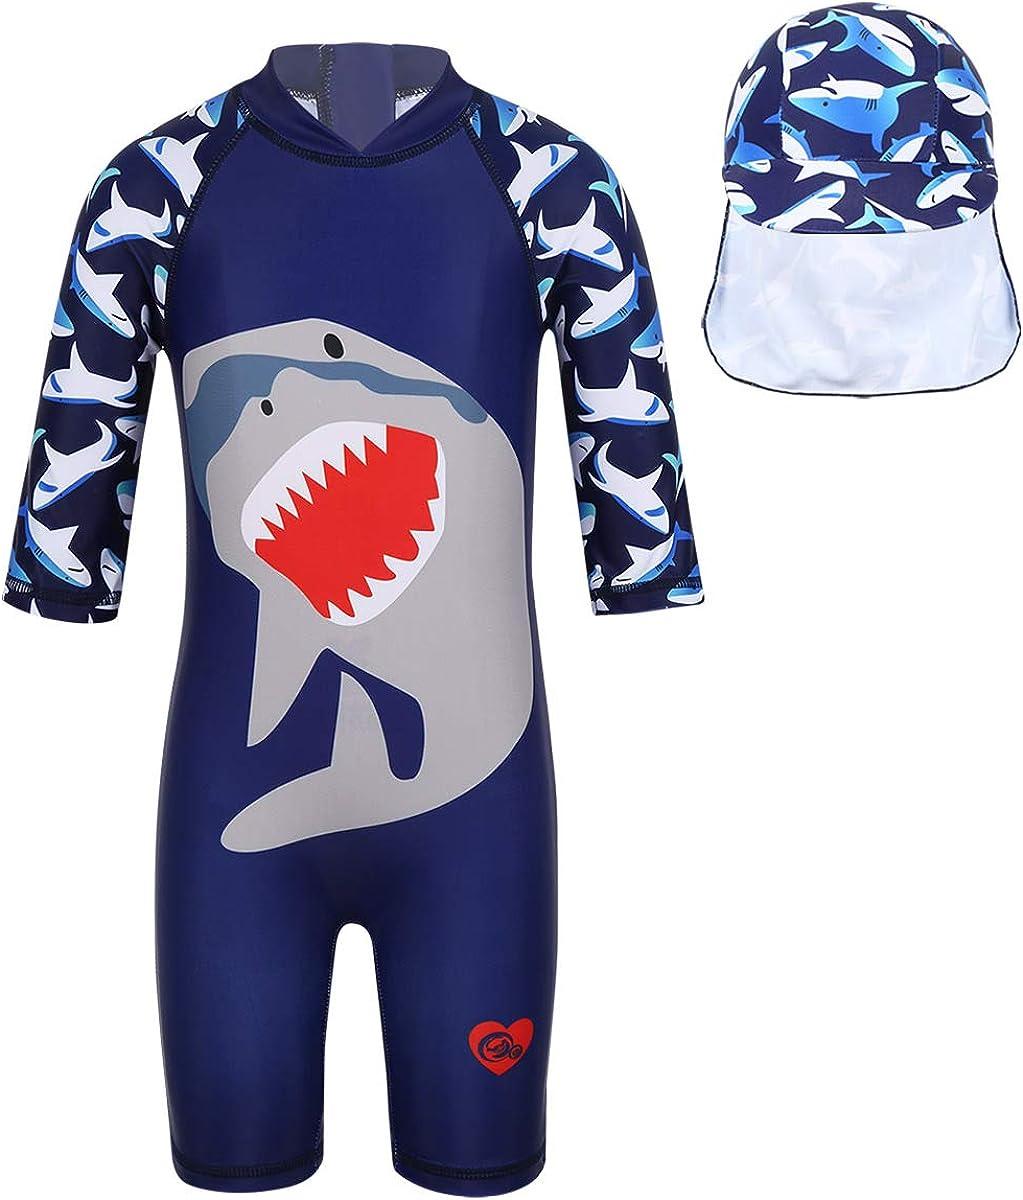 Mays Kids Boys Shark Design Sun Protection Swimwear Swimming Bathing Onepiece Swimsuit